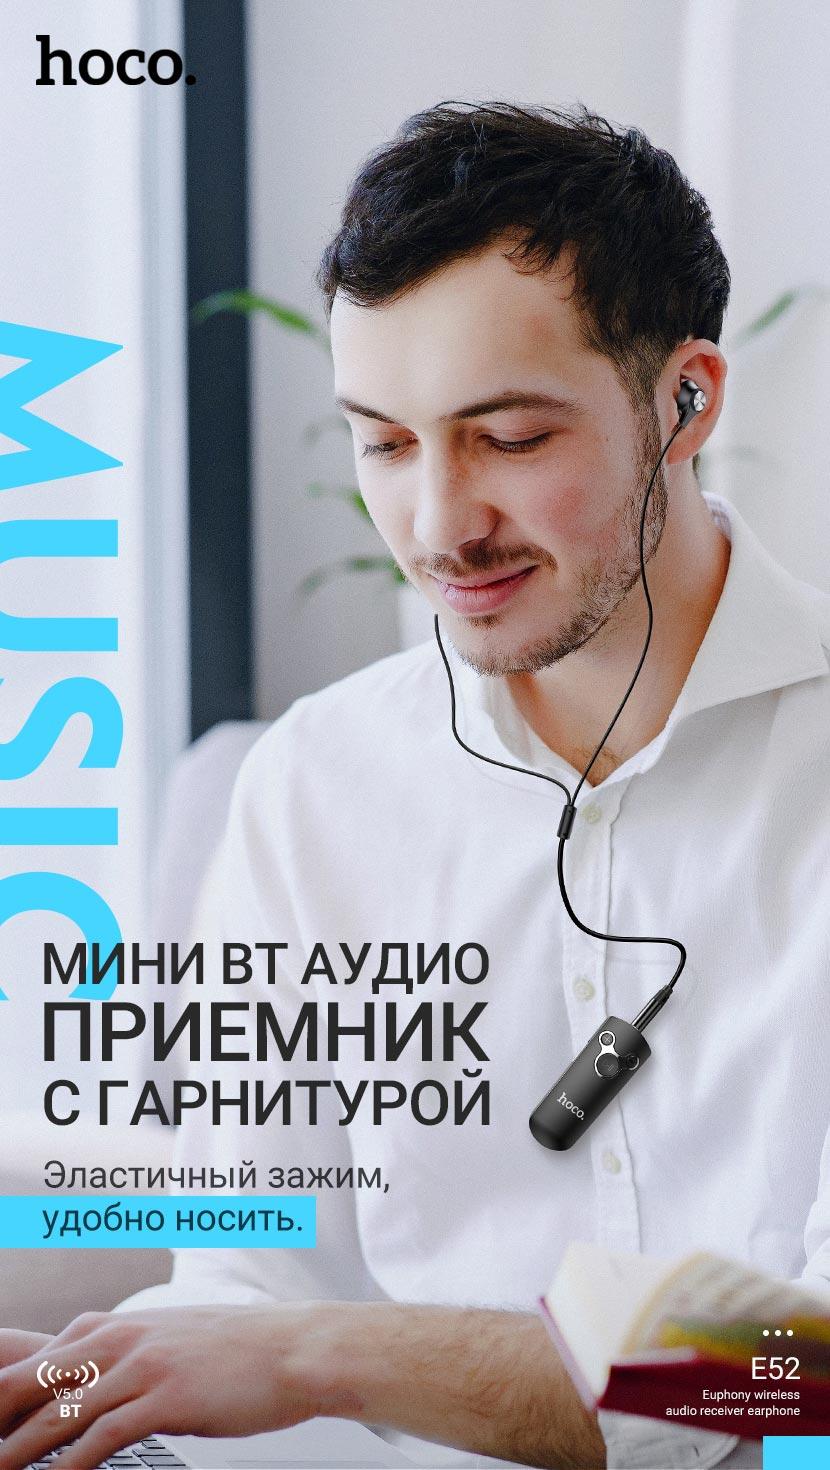 hoco news e52 euphony wireless audio receiver earphones ru